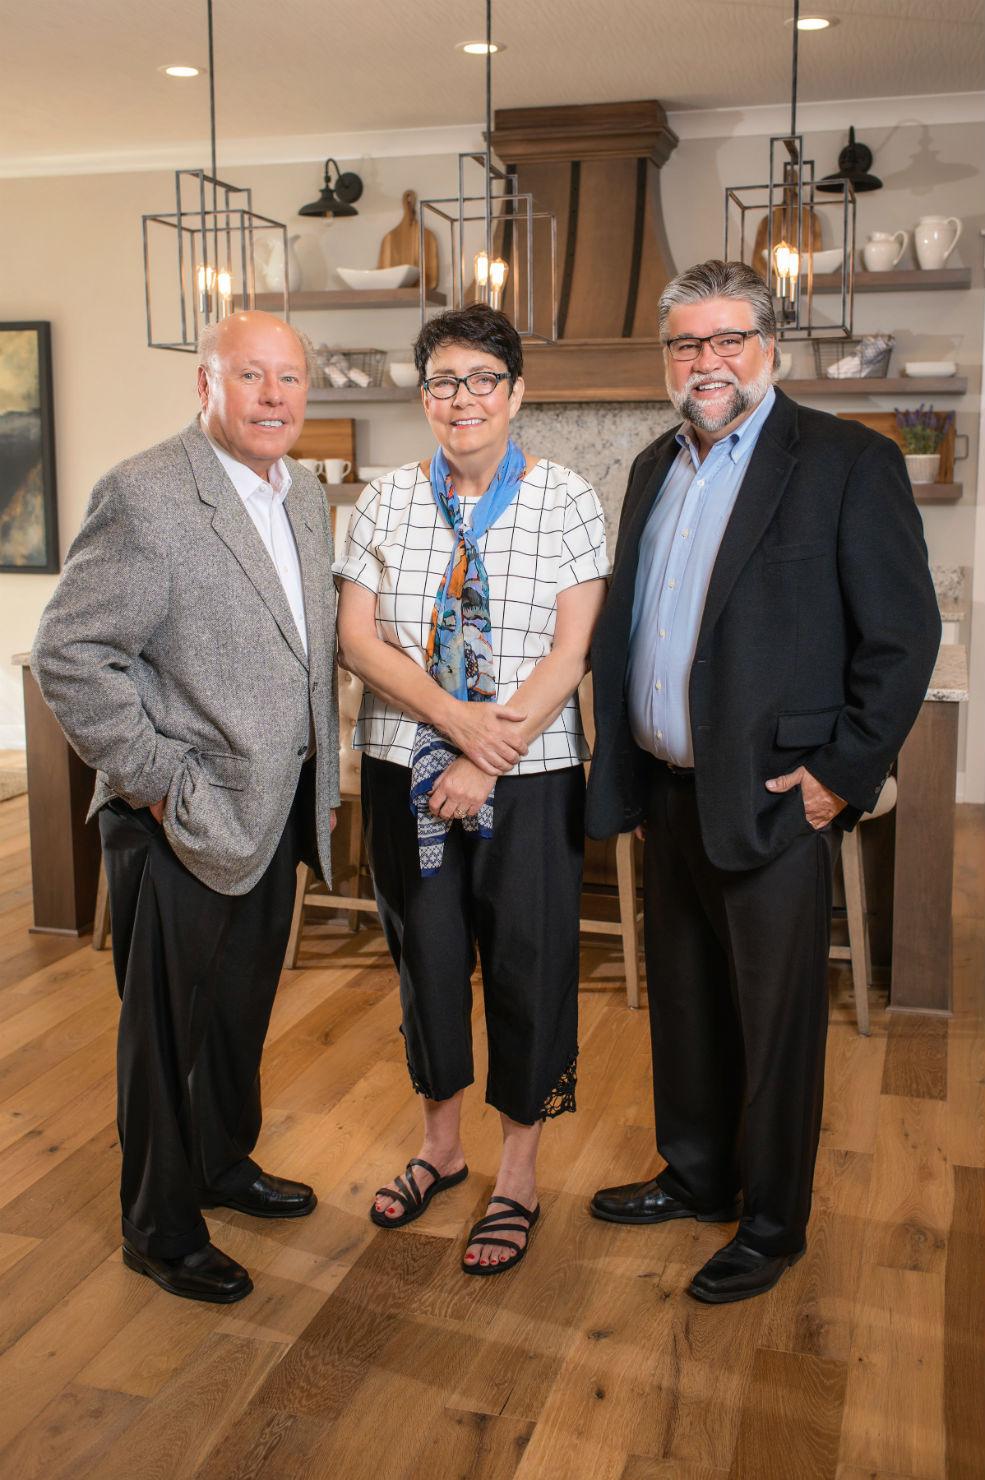 Steve Smith & Barbara George Team